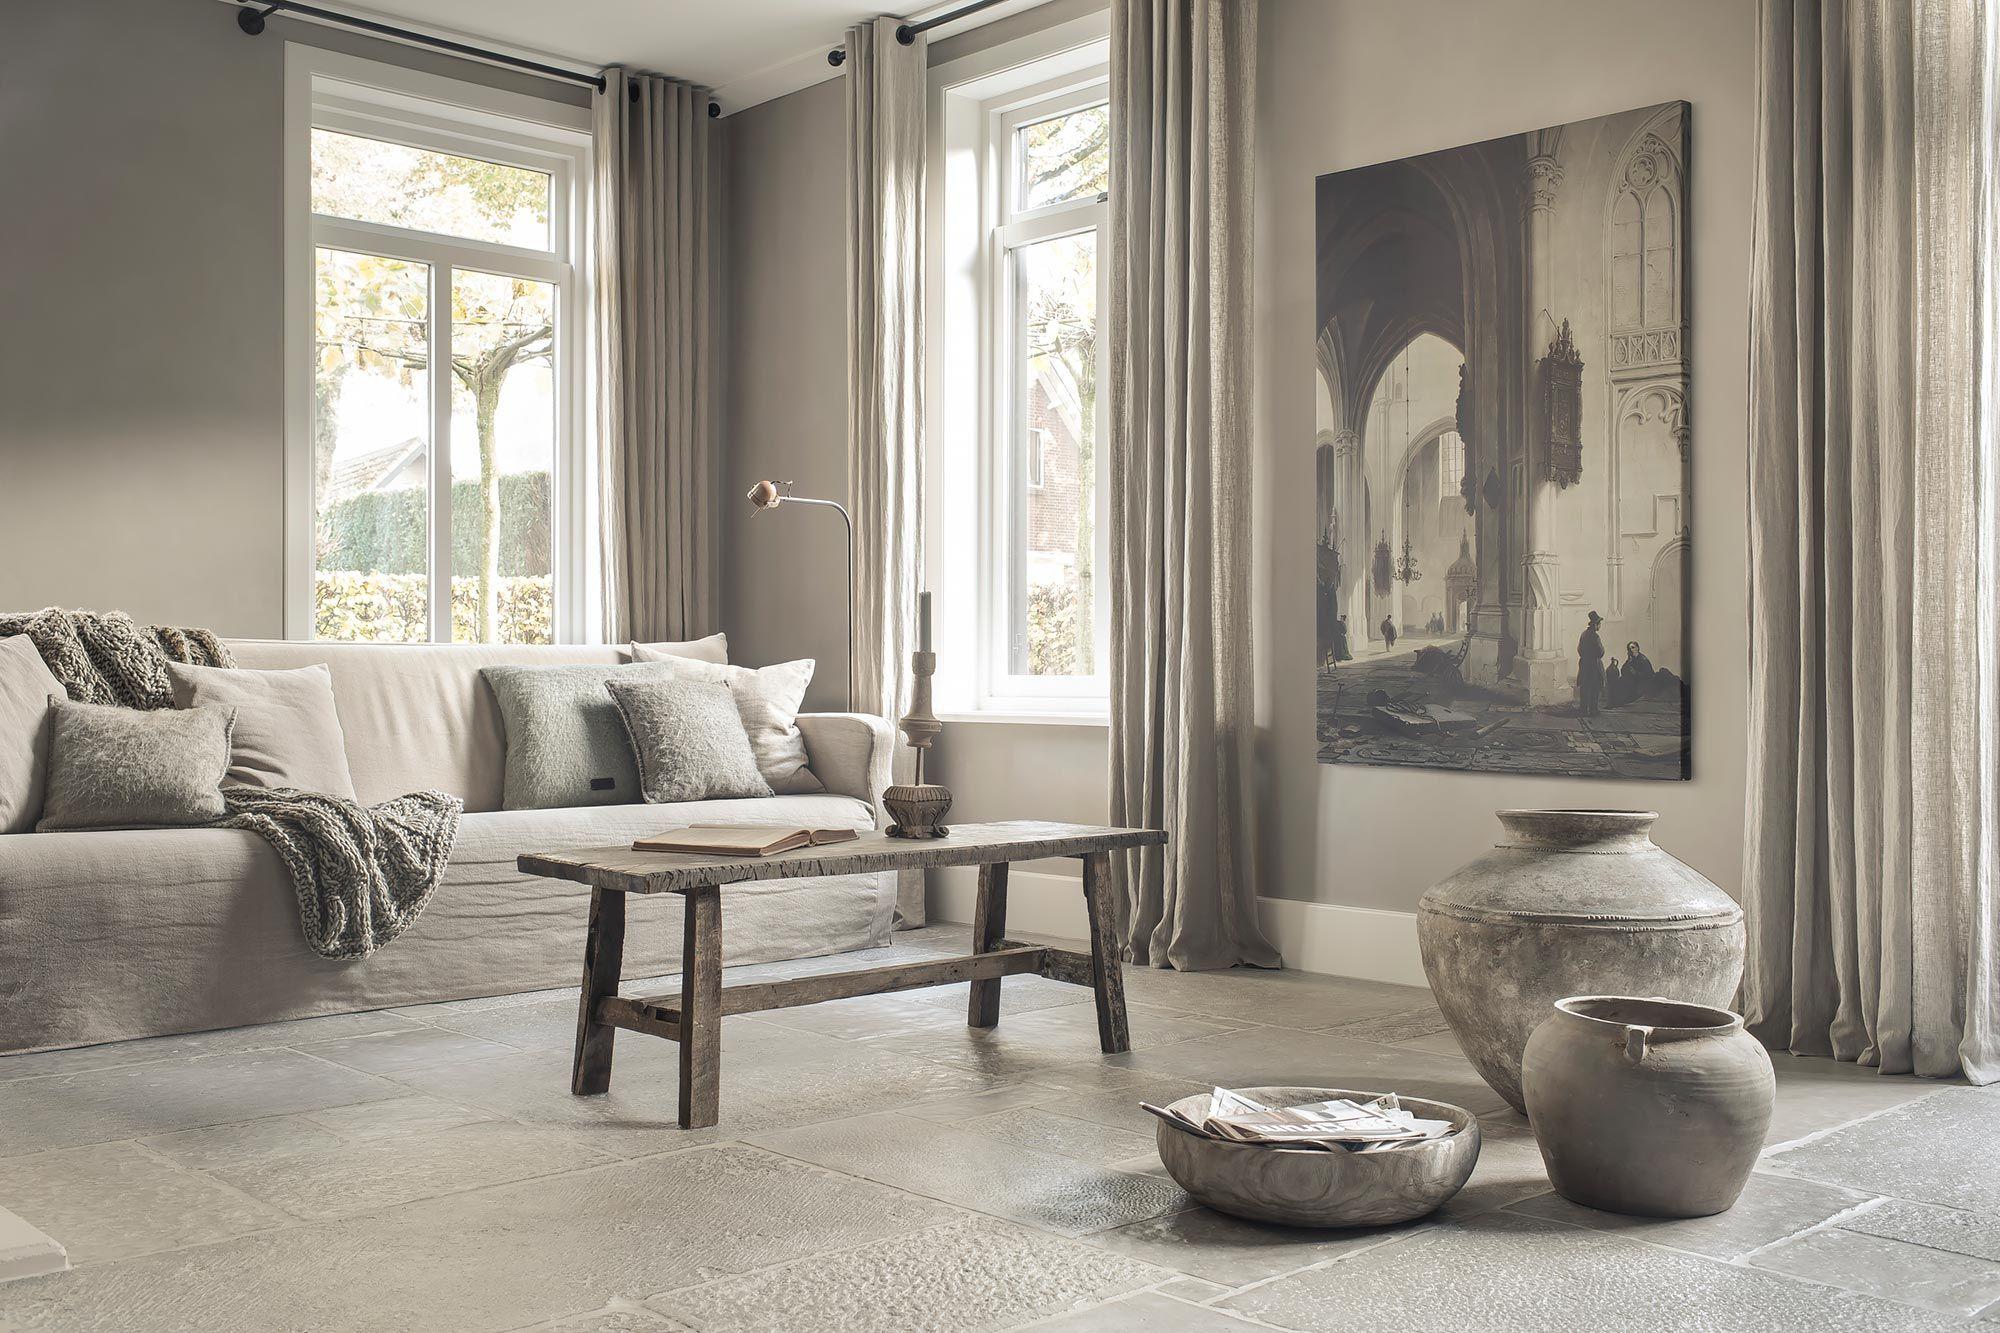 Hoffz interieur stenen vloer for Oud herenhuis interieur